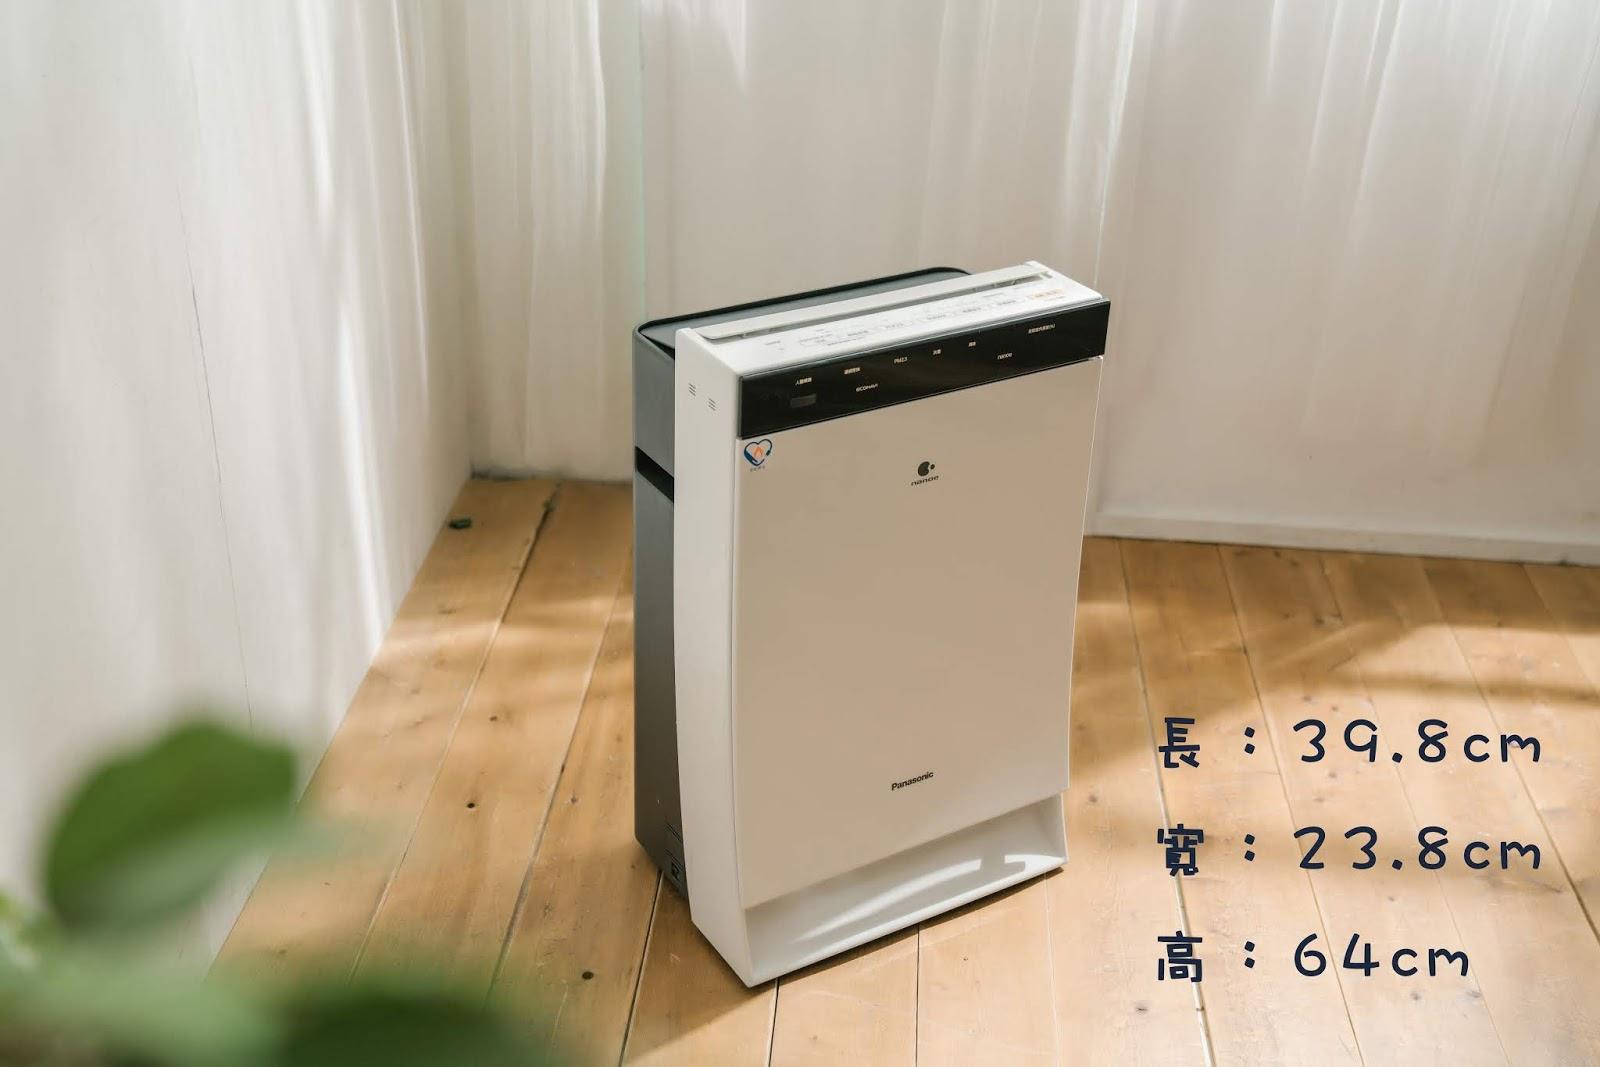 5.Panasonic_dj%25E7%2590%25A6%25E7%2590%25A6_wwwhostkikicom_%25E5%25B0%25BA%25E5%25AF%25B8Panasonic%25E6%25B8%2585%25E6%25B7%25A8%25E6%25A9%259F.jpg-雙重淨化室內空氣,用空氣清淨機打擊換季過敏生病